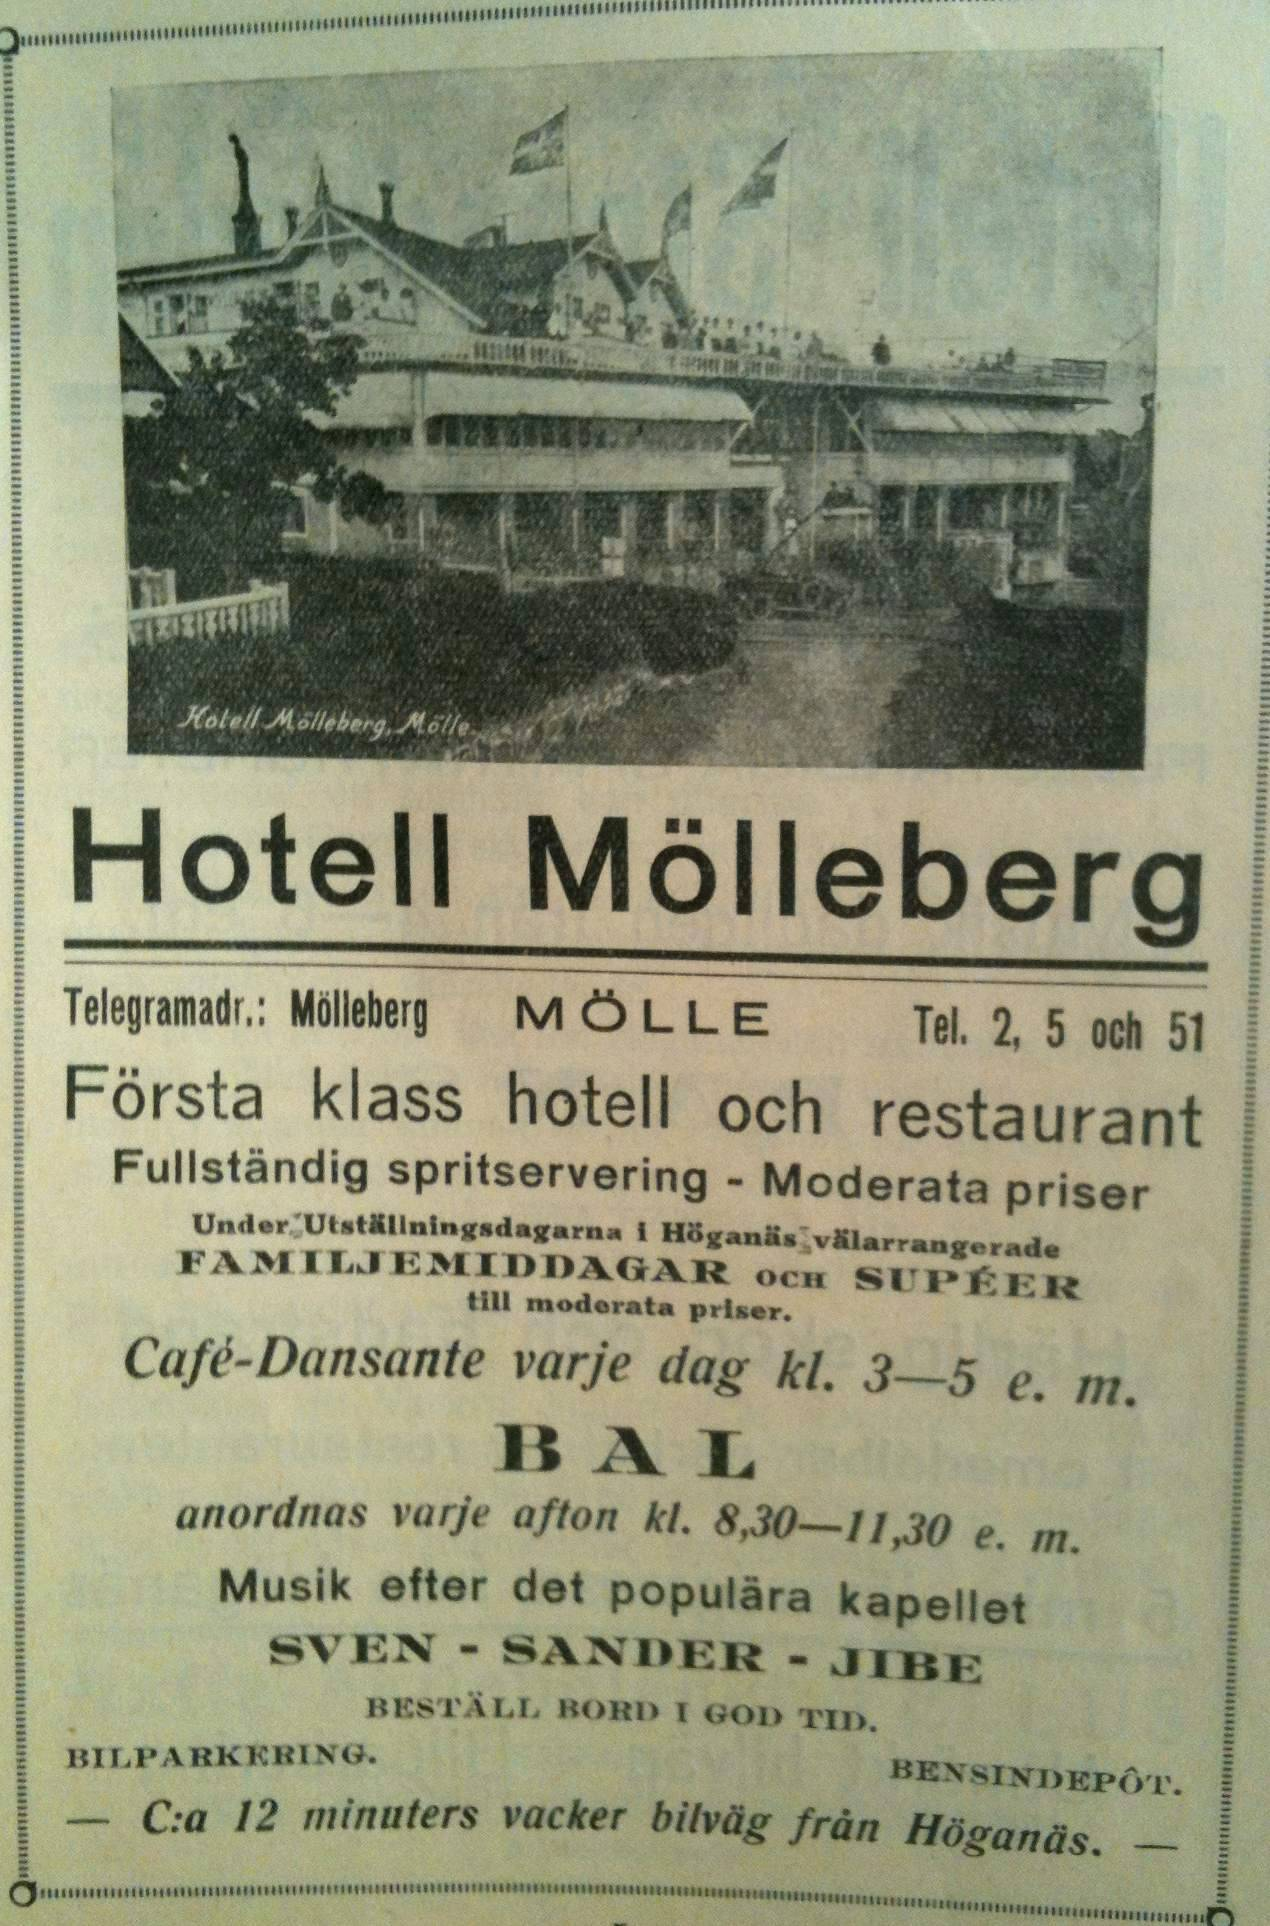 Hotell Molleberg 1928